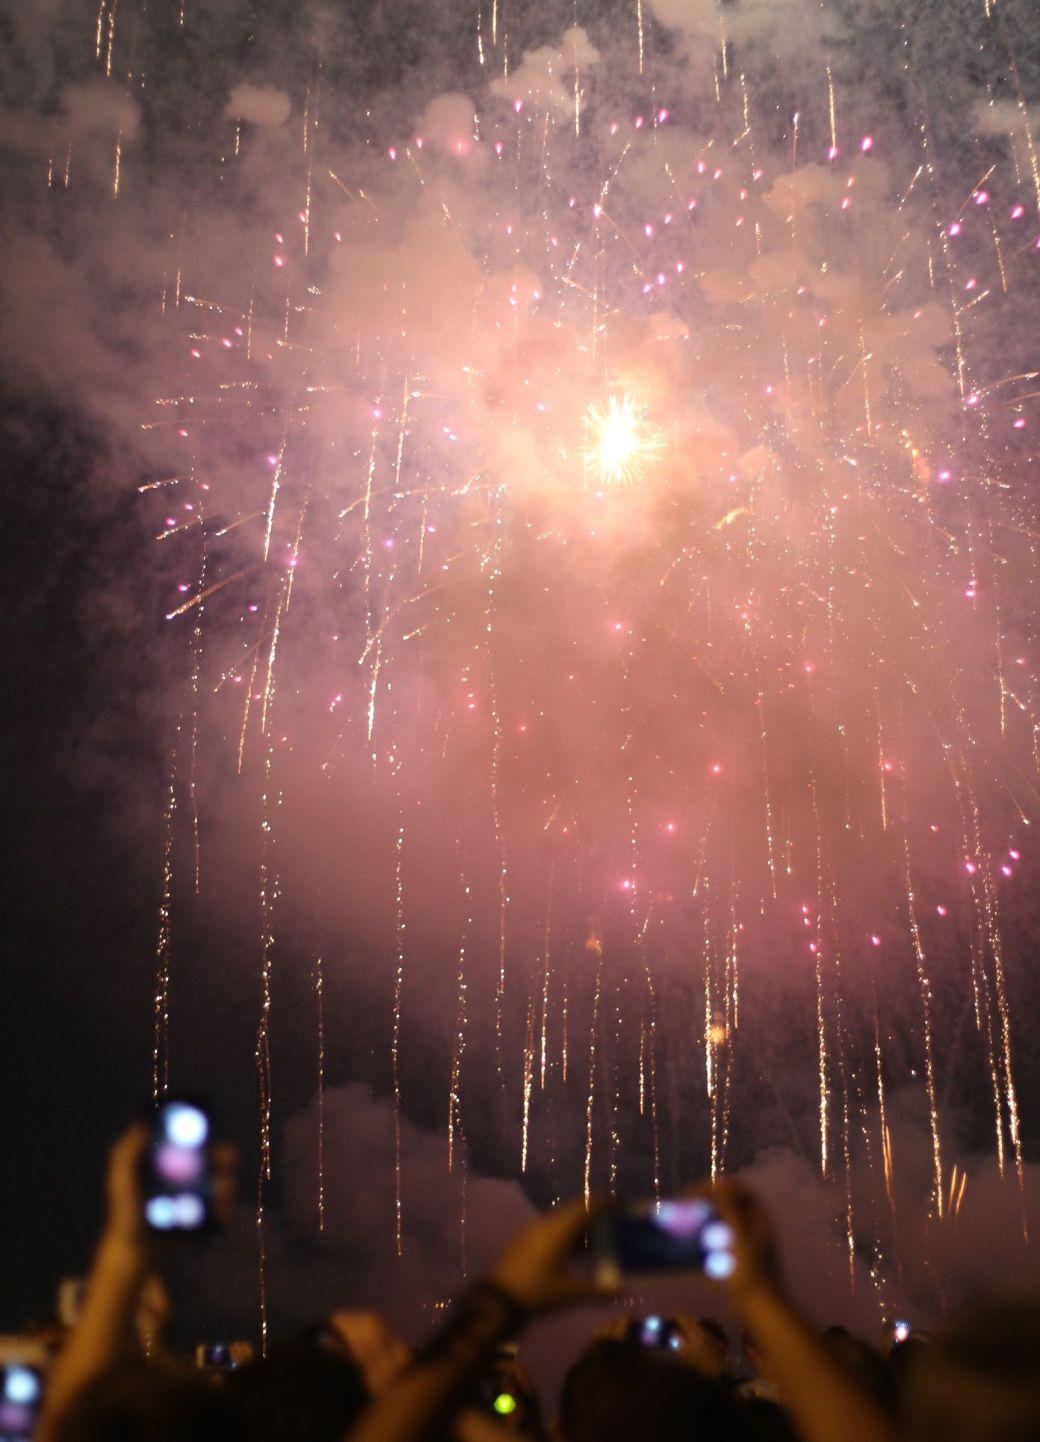 boston july 4th fireworks celebration firework 15